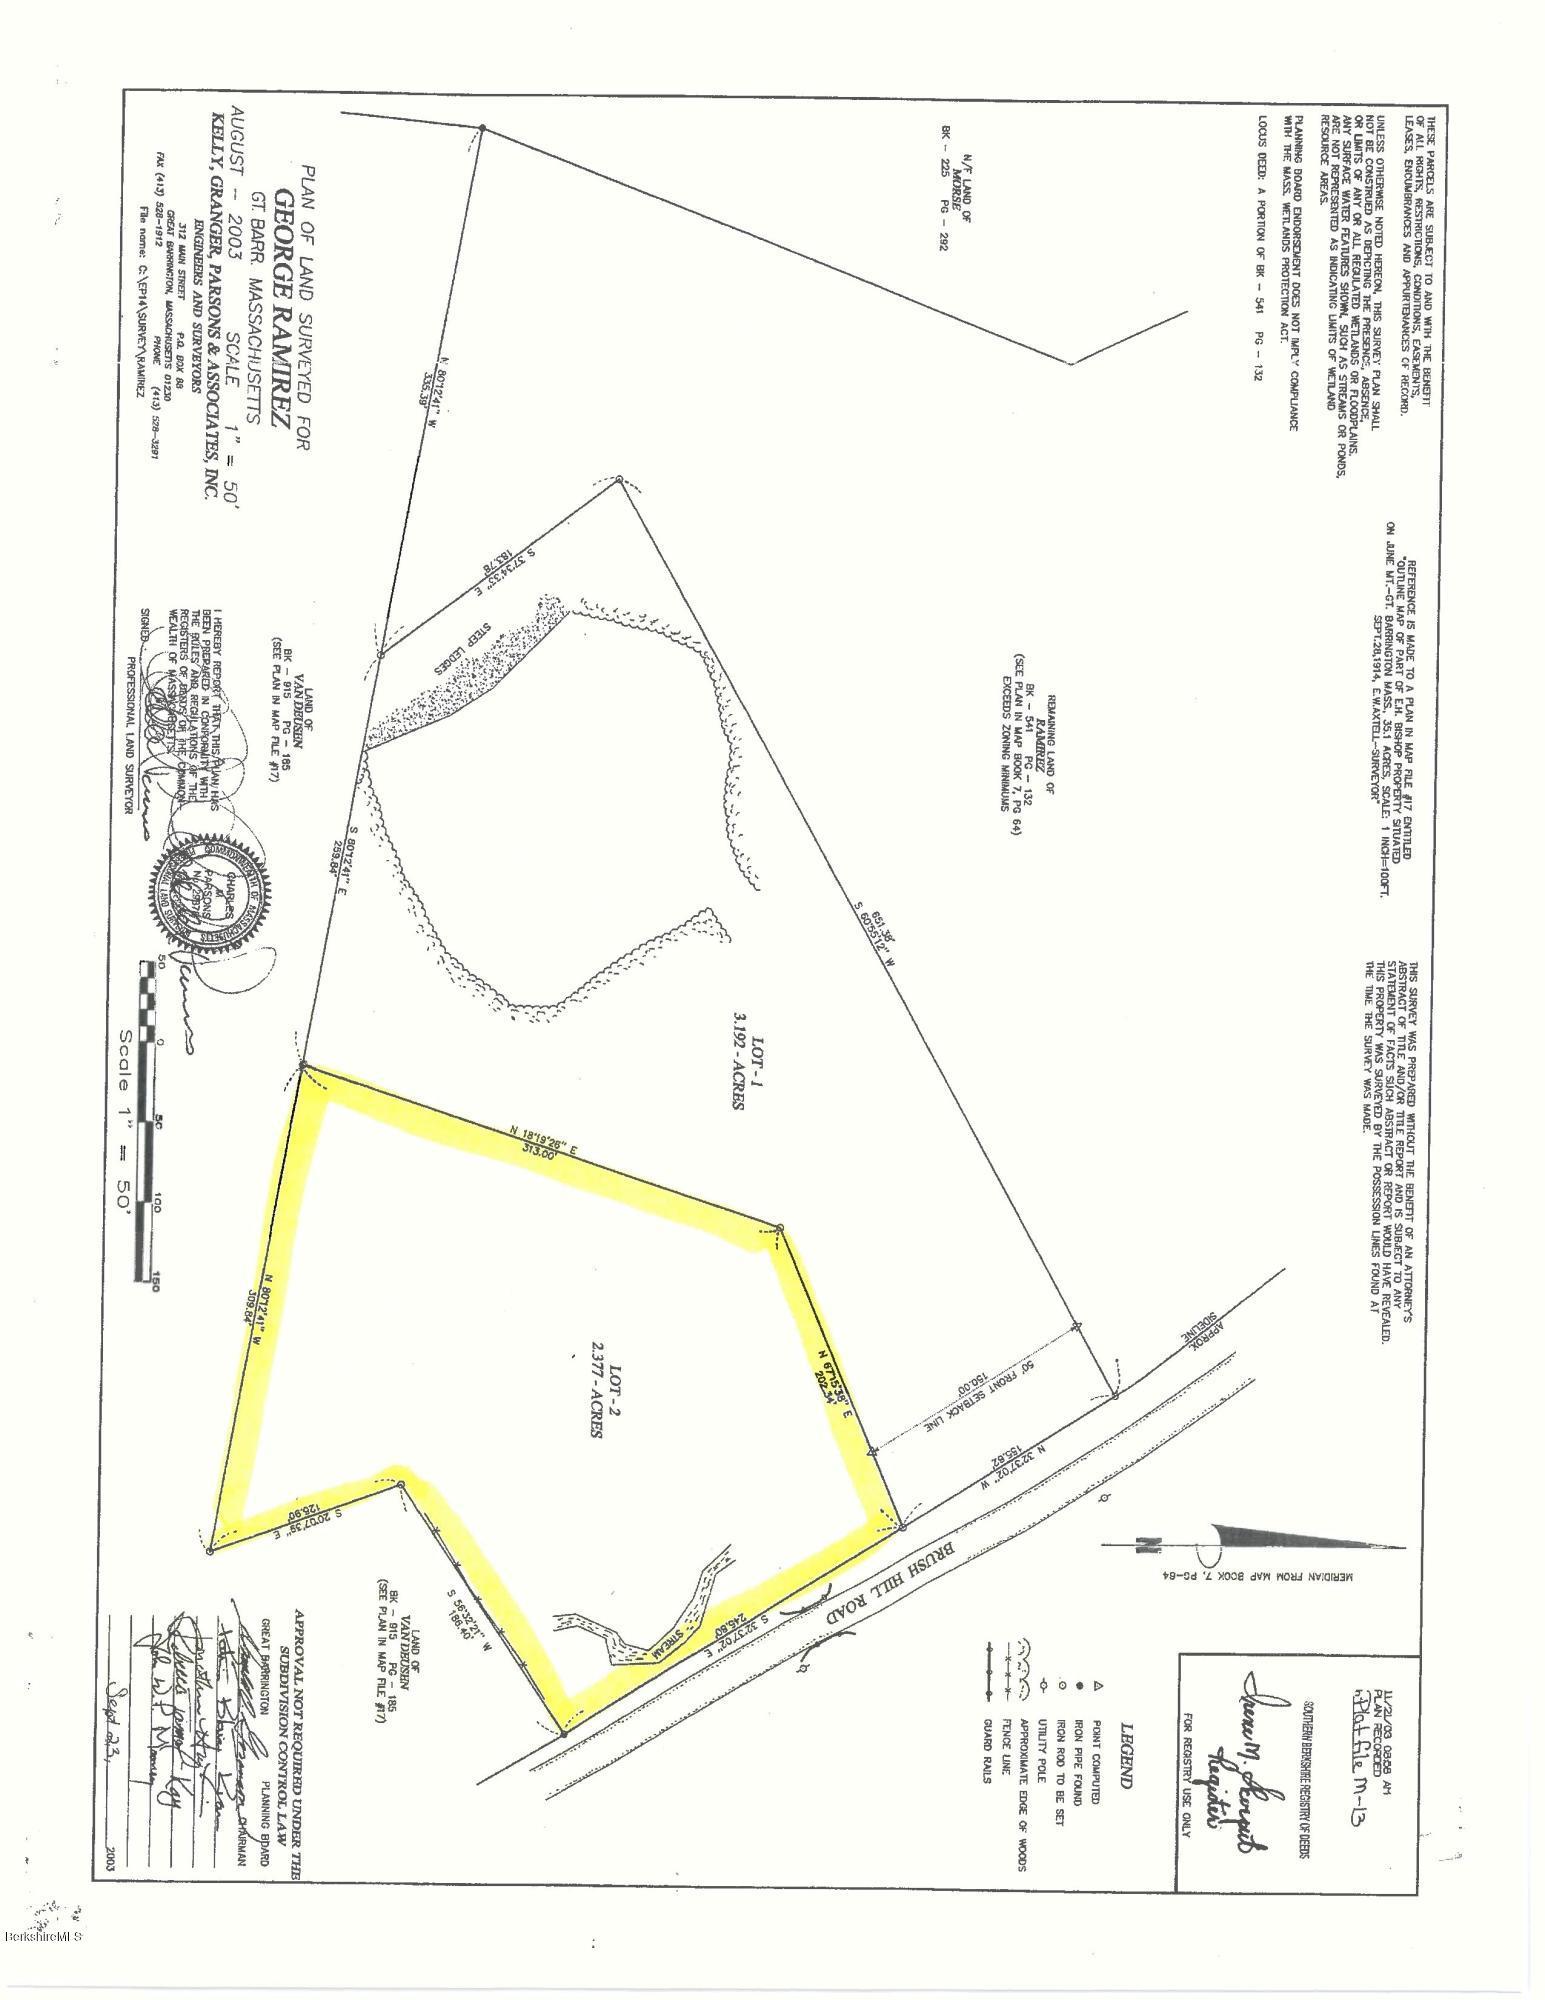 76 Brush Hill Great Barrington MA 01230